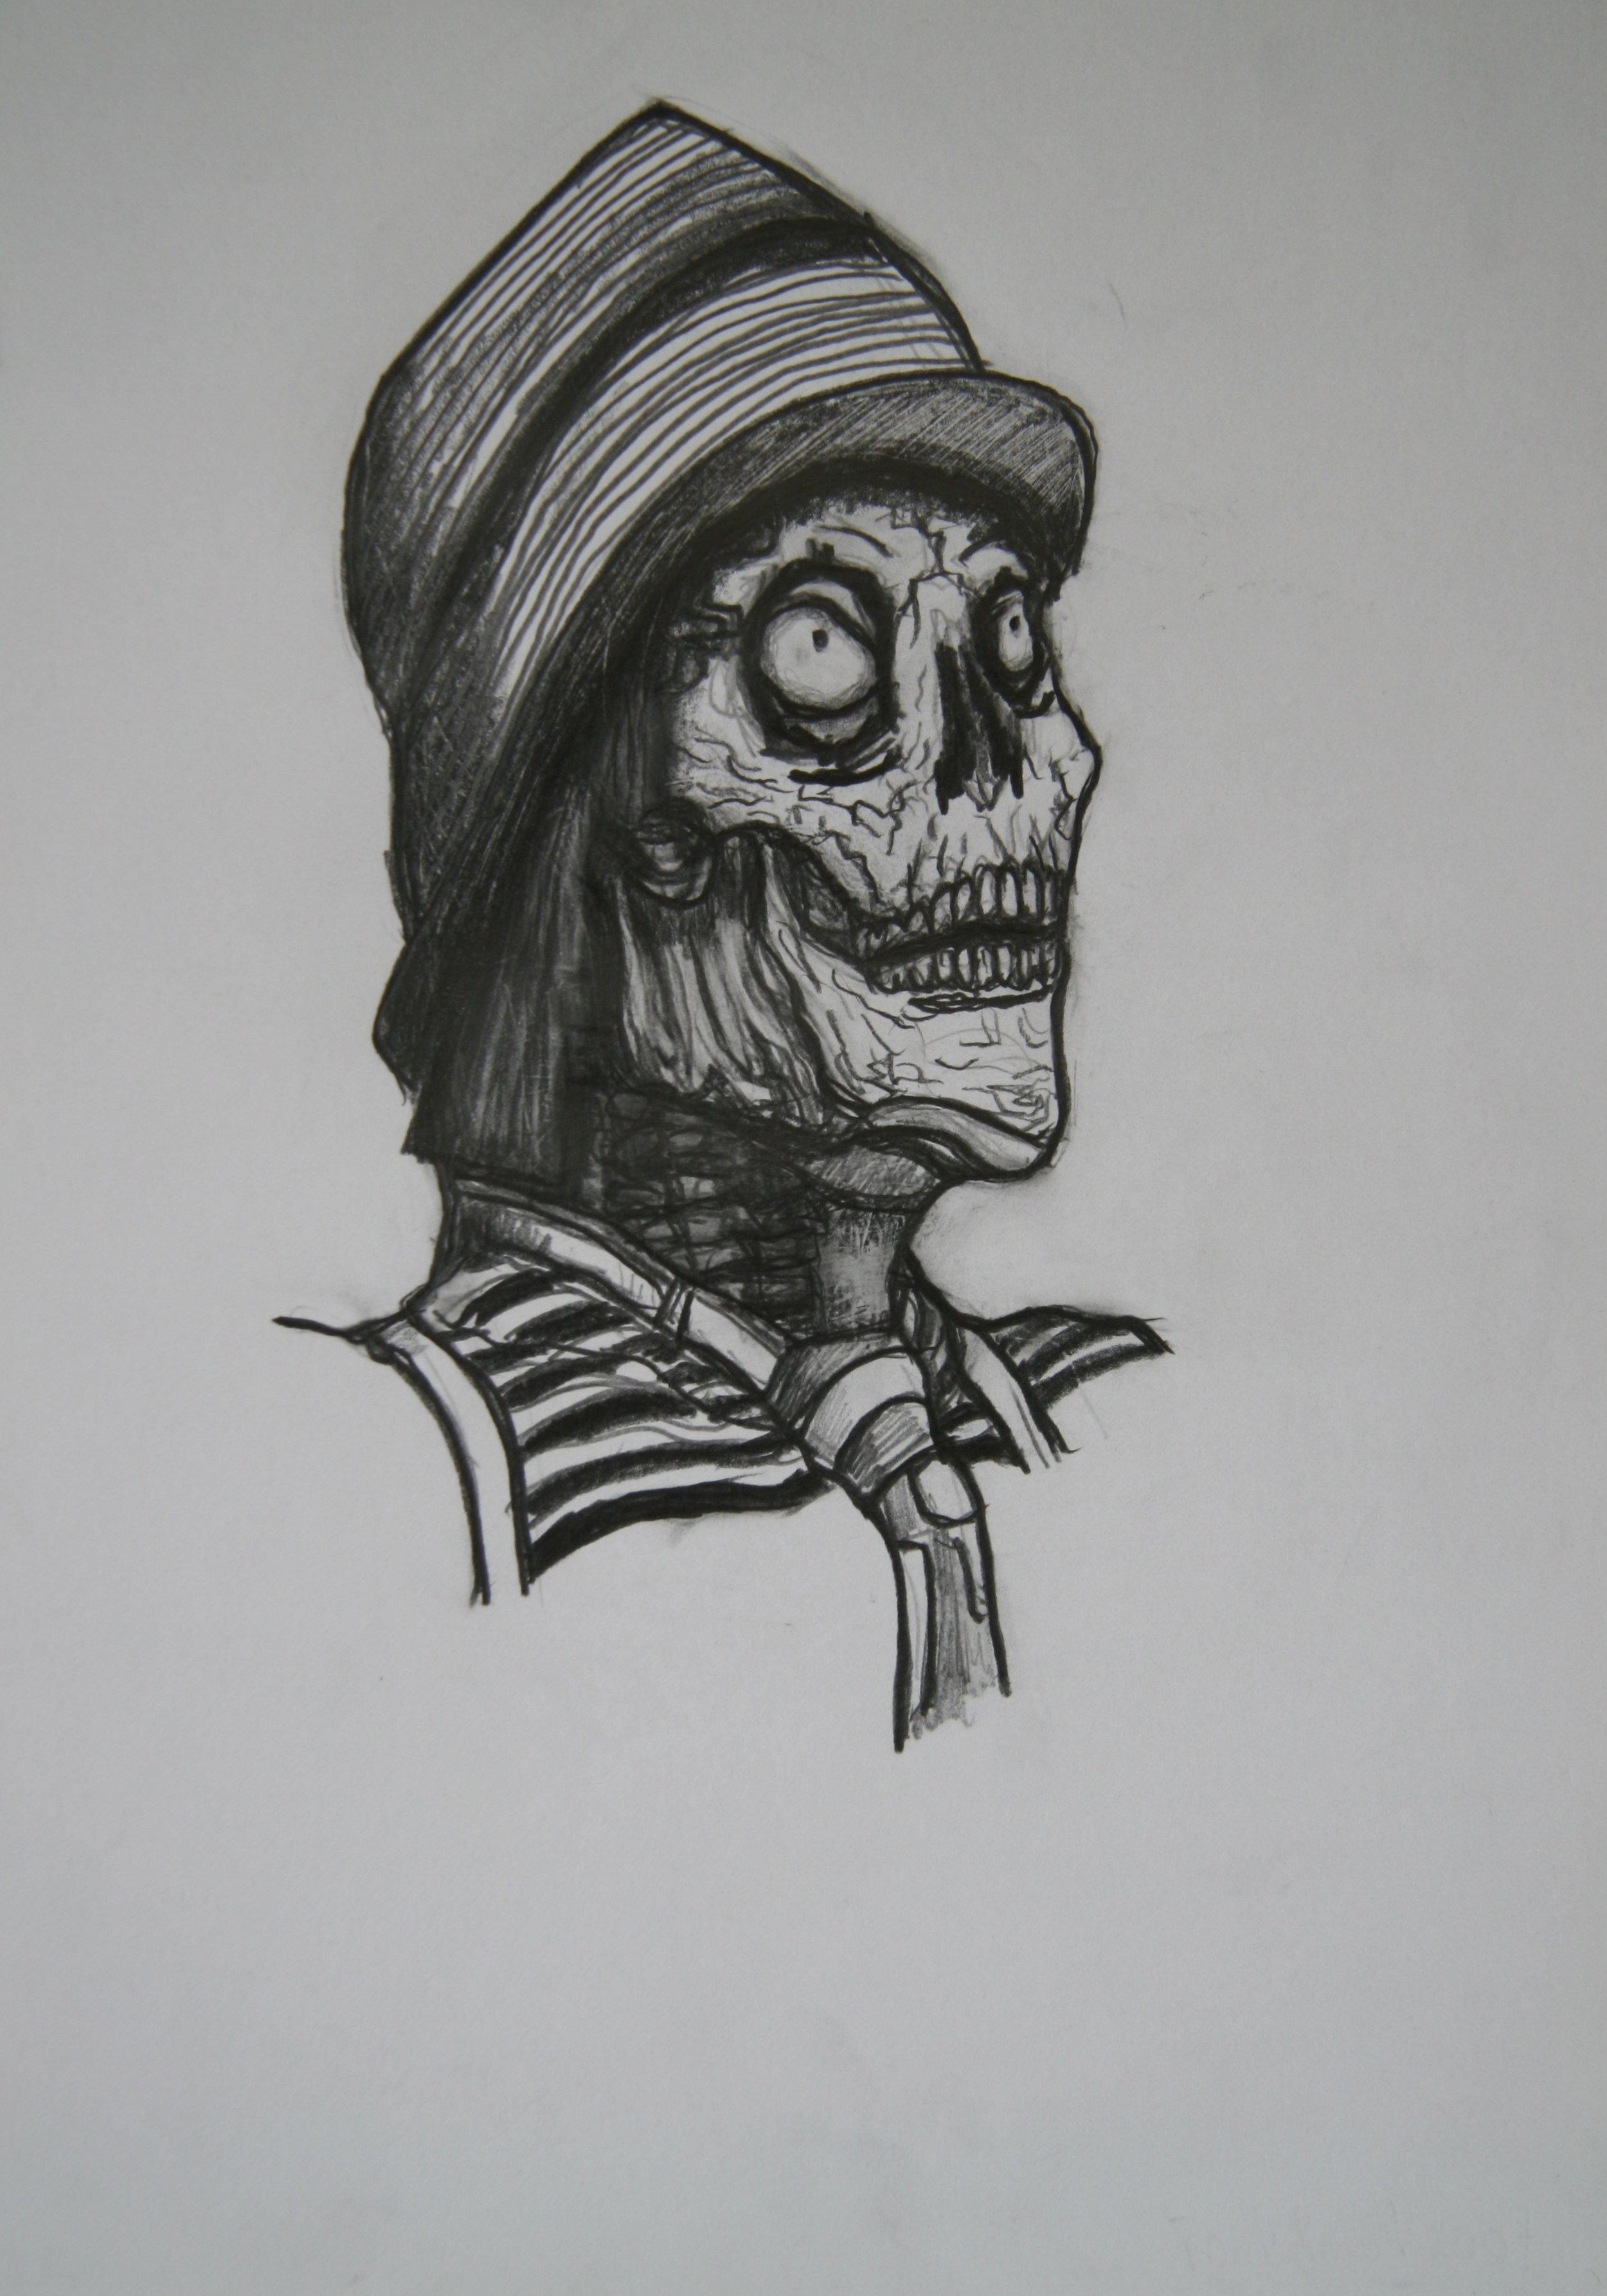 Skull 12, 30x21cm, pencil on paper